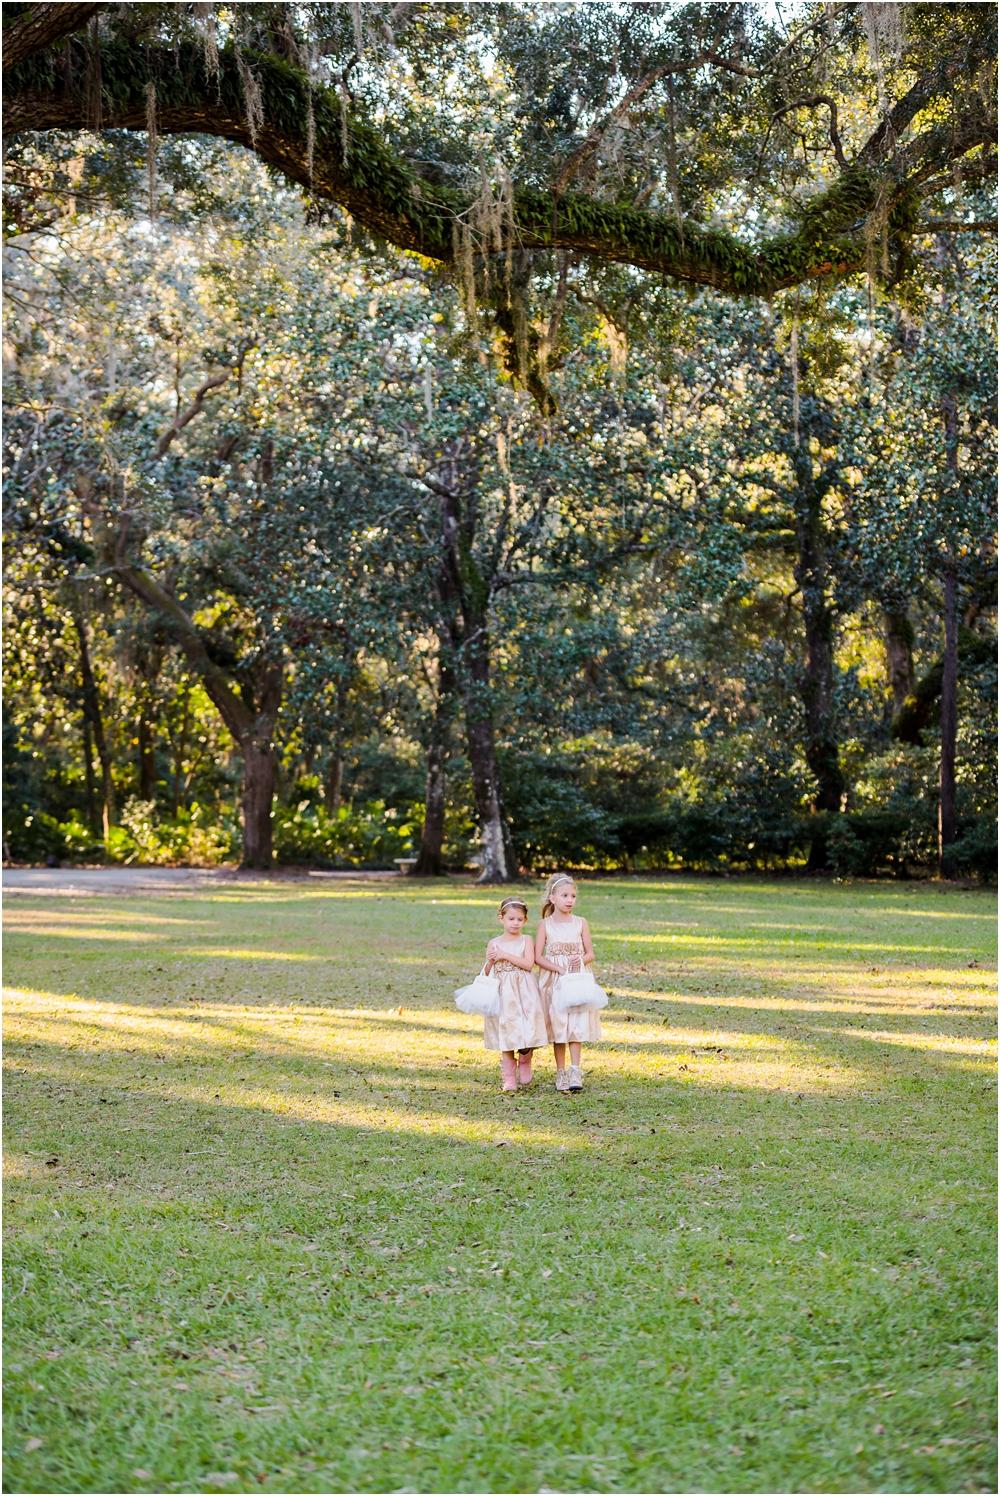 Eden-Gardens-florida-wedding-photographer-kiersten-stevenson-photography-49.jpg